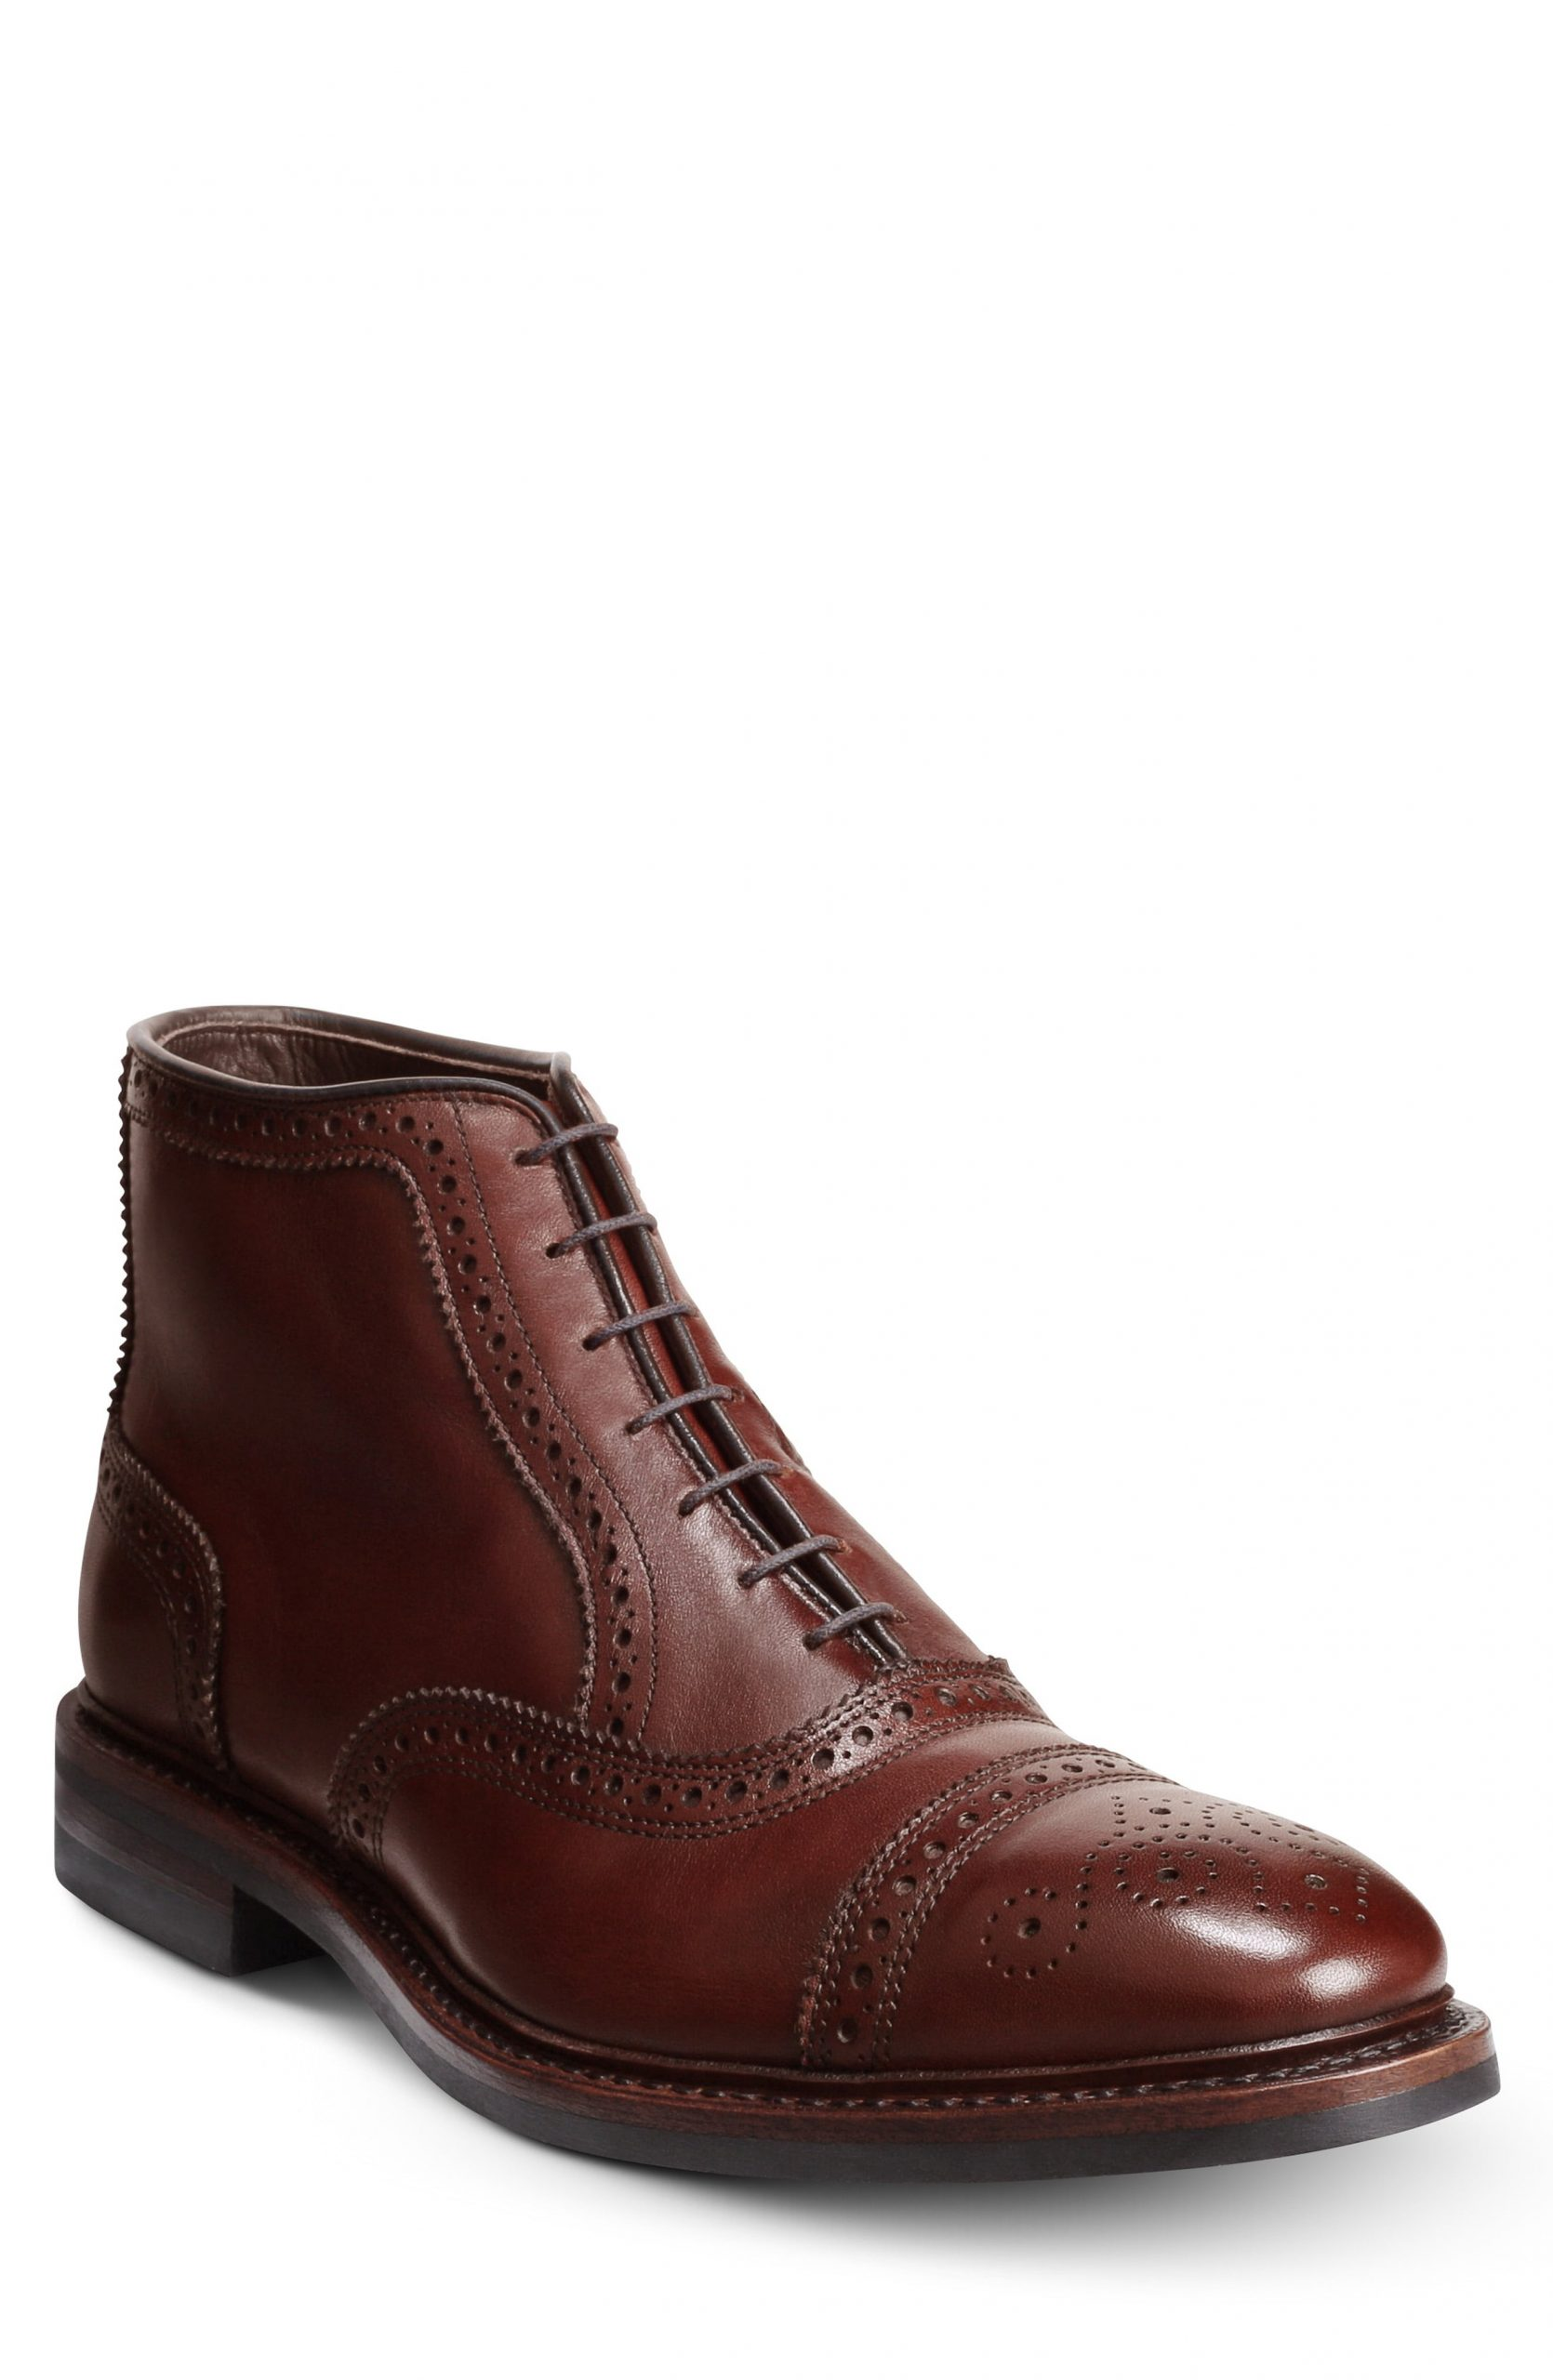 allen edmonds all weather boots